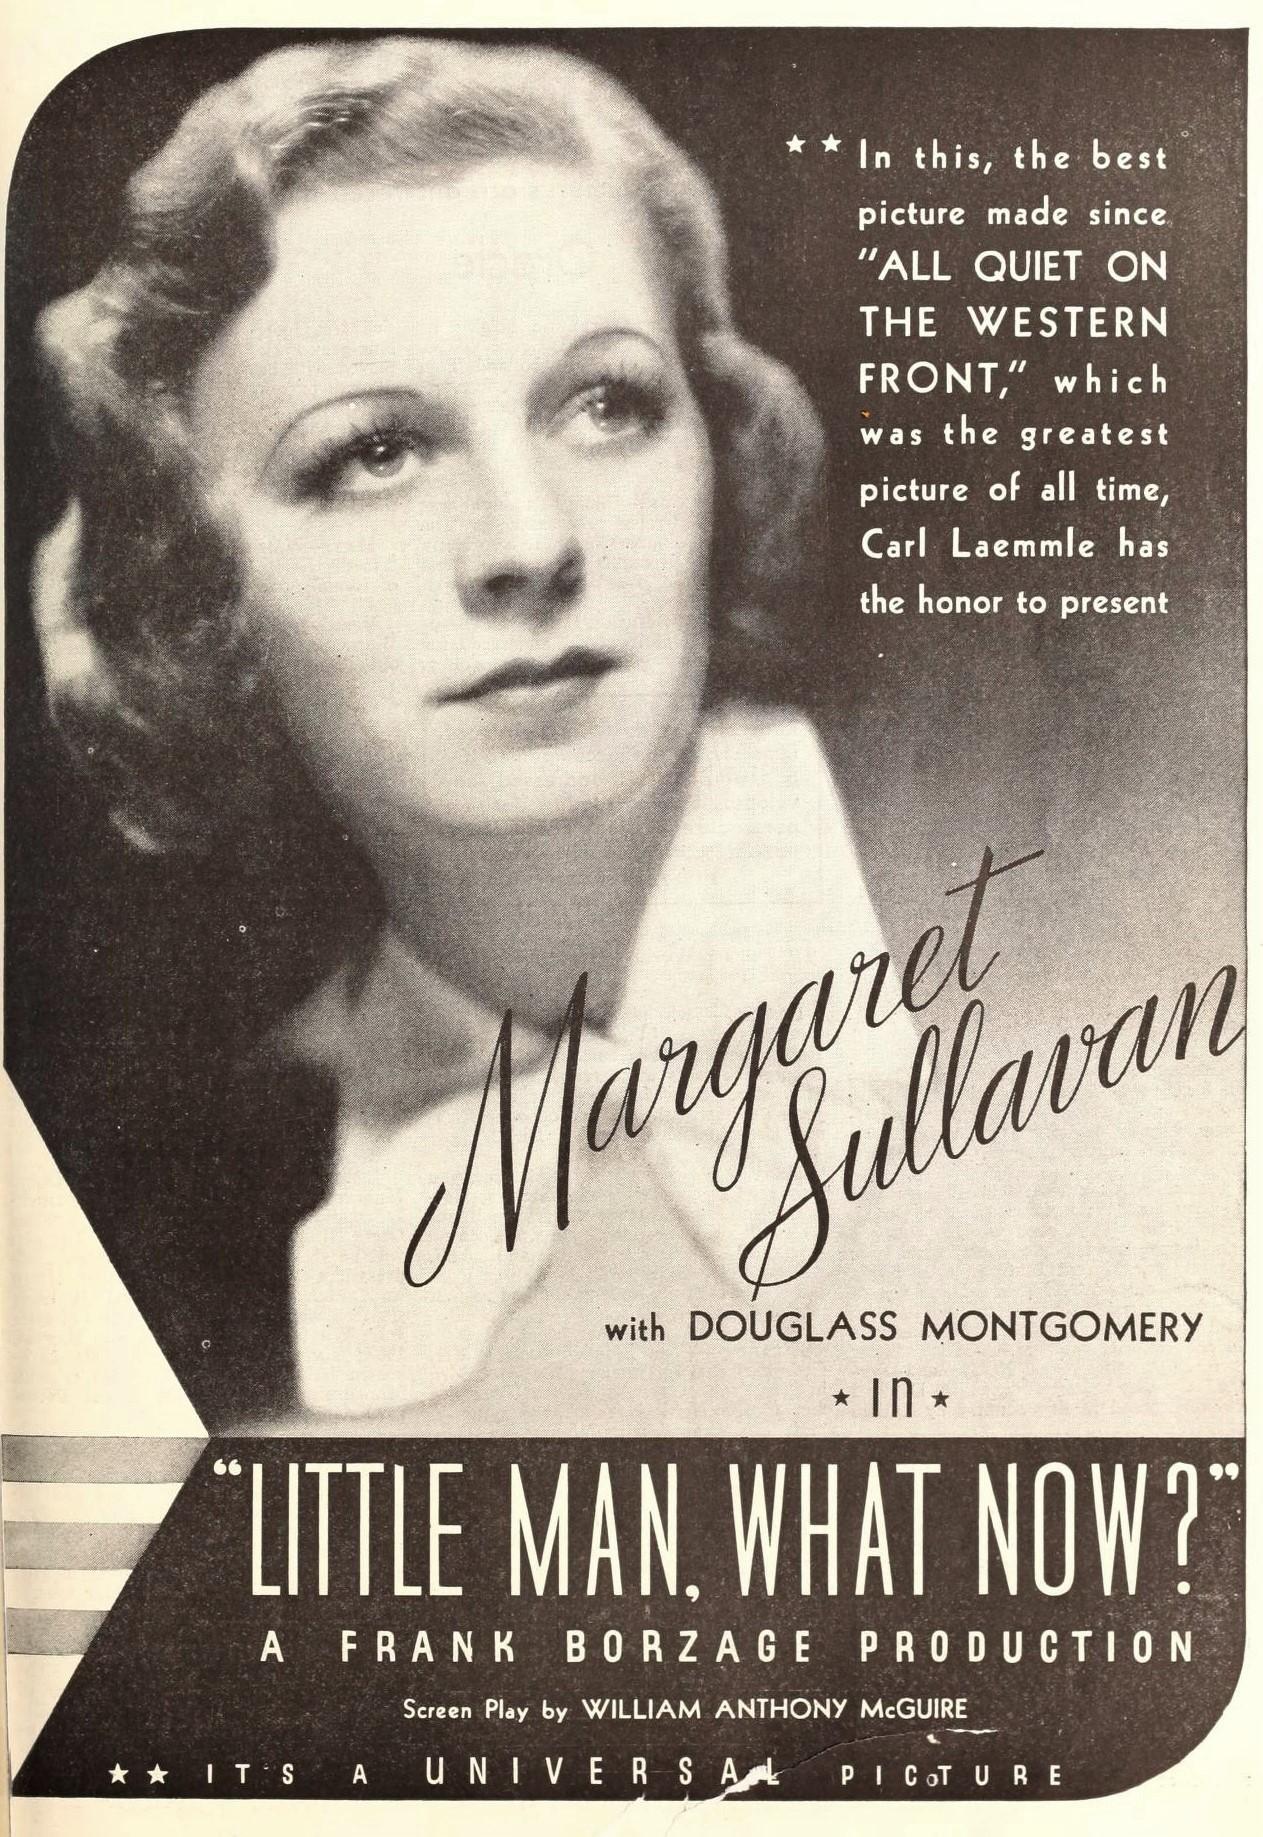 Margaret_Sullavan_in_'_Little_Man,_What_Now',_1934.jpg